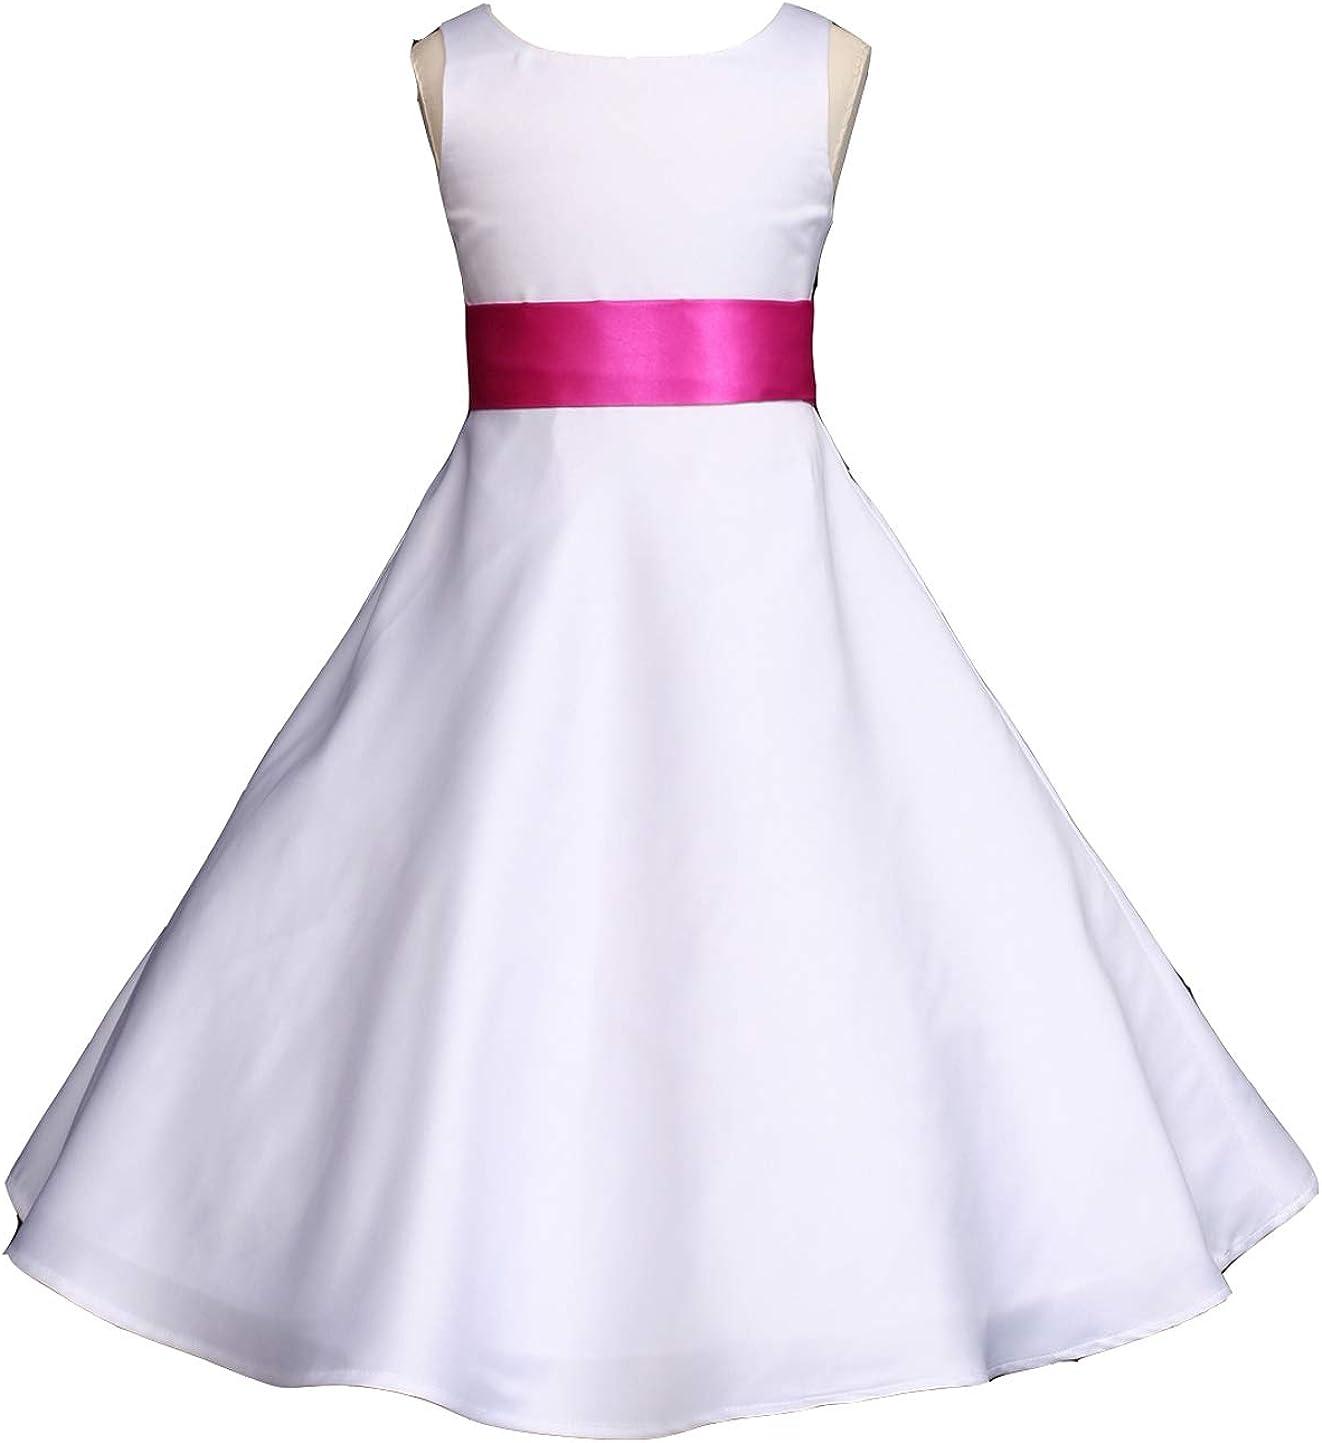 Pink Promise Wedding Pageant White A-Line Matte Satin Jr. Bridesmaid Flower Girl Dress